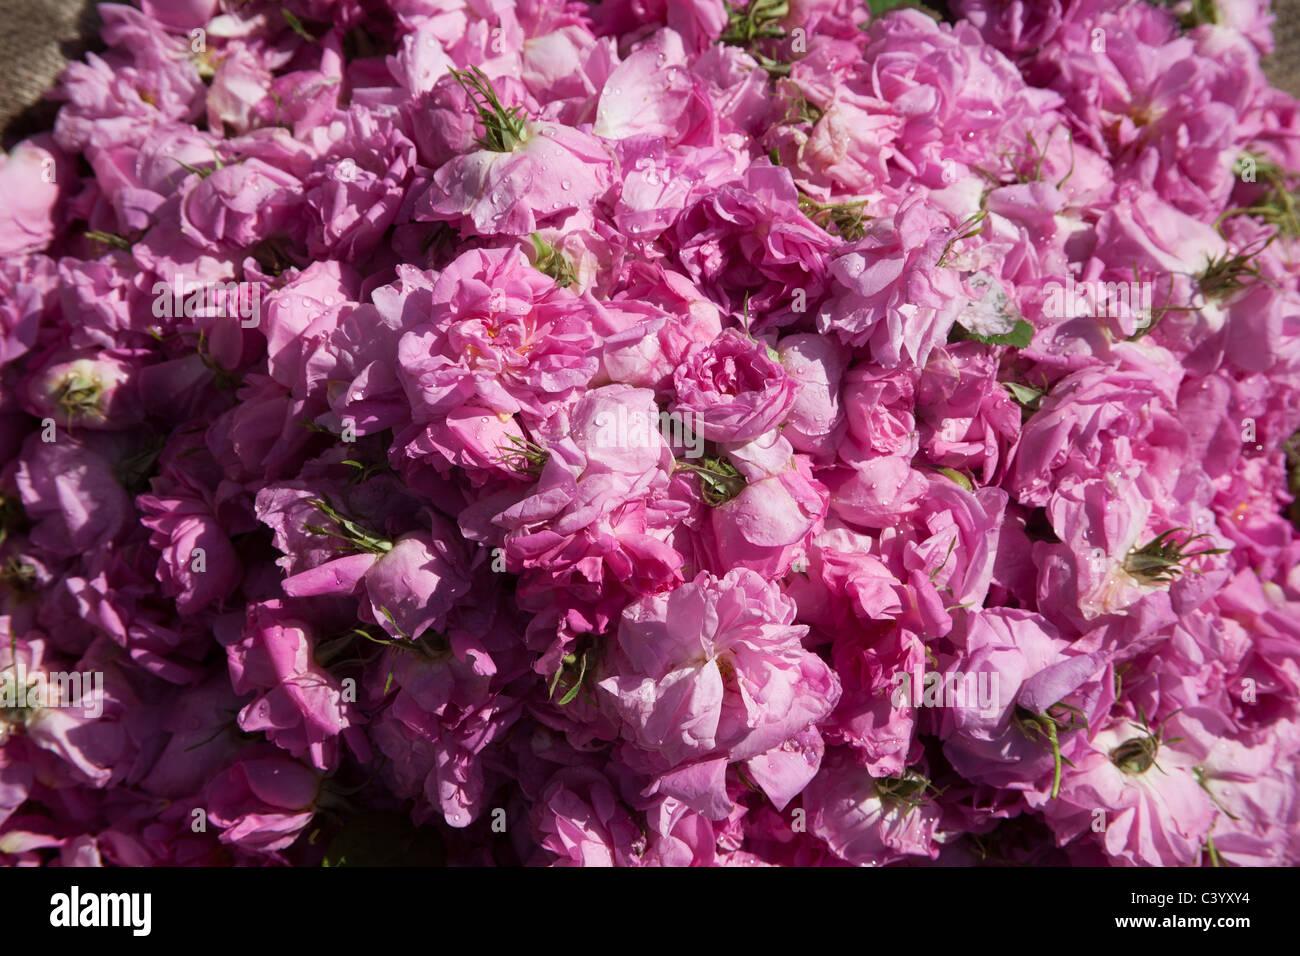 Rose Petals In A Shop During The Rose Festival In El Kelaa M Gouna